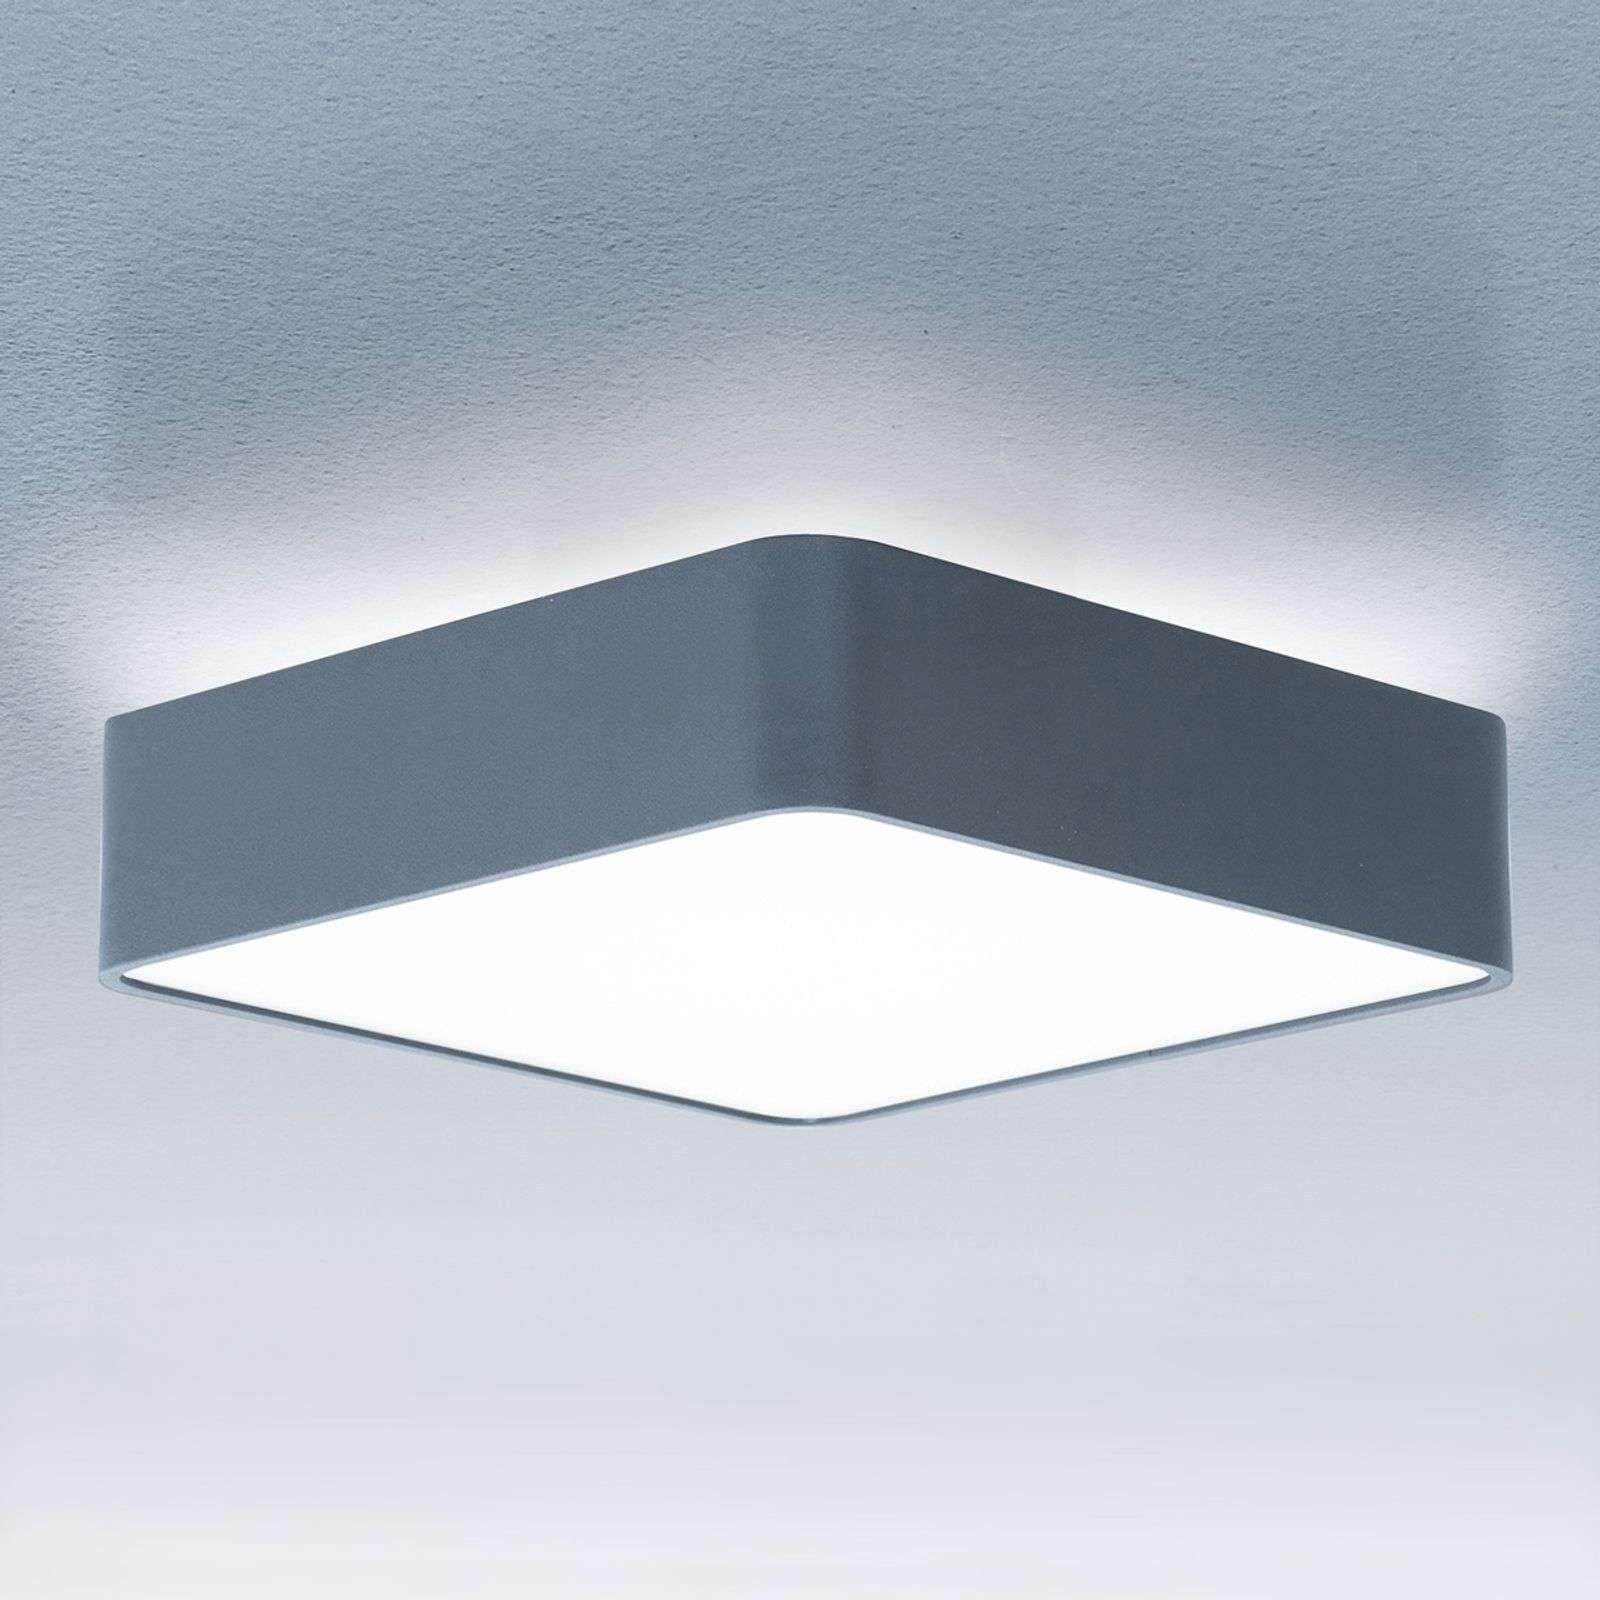 Led Plafondlamp Badkamer Takken Lamp Plafond Industriele Plafondlamp Keuken Slaapkamer Plafonnieres Lampe Plafond Le In 2020 Plafondlamp Plafondverlichting Led